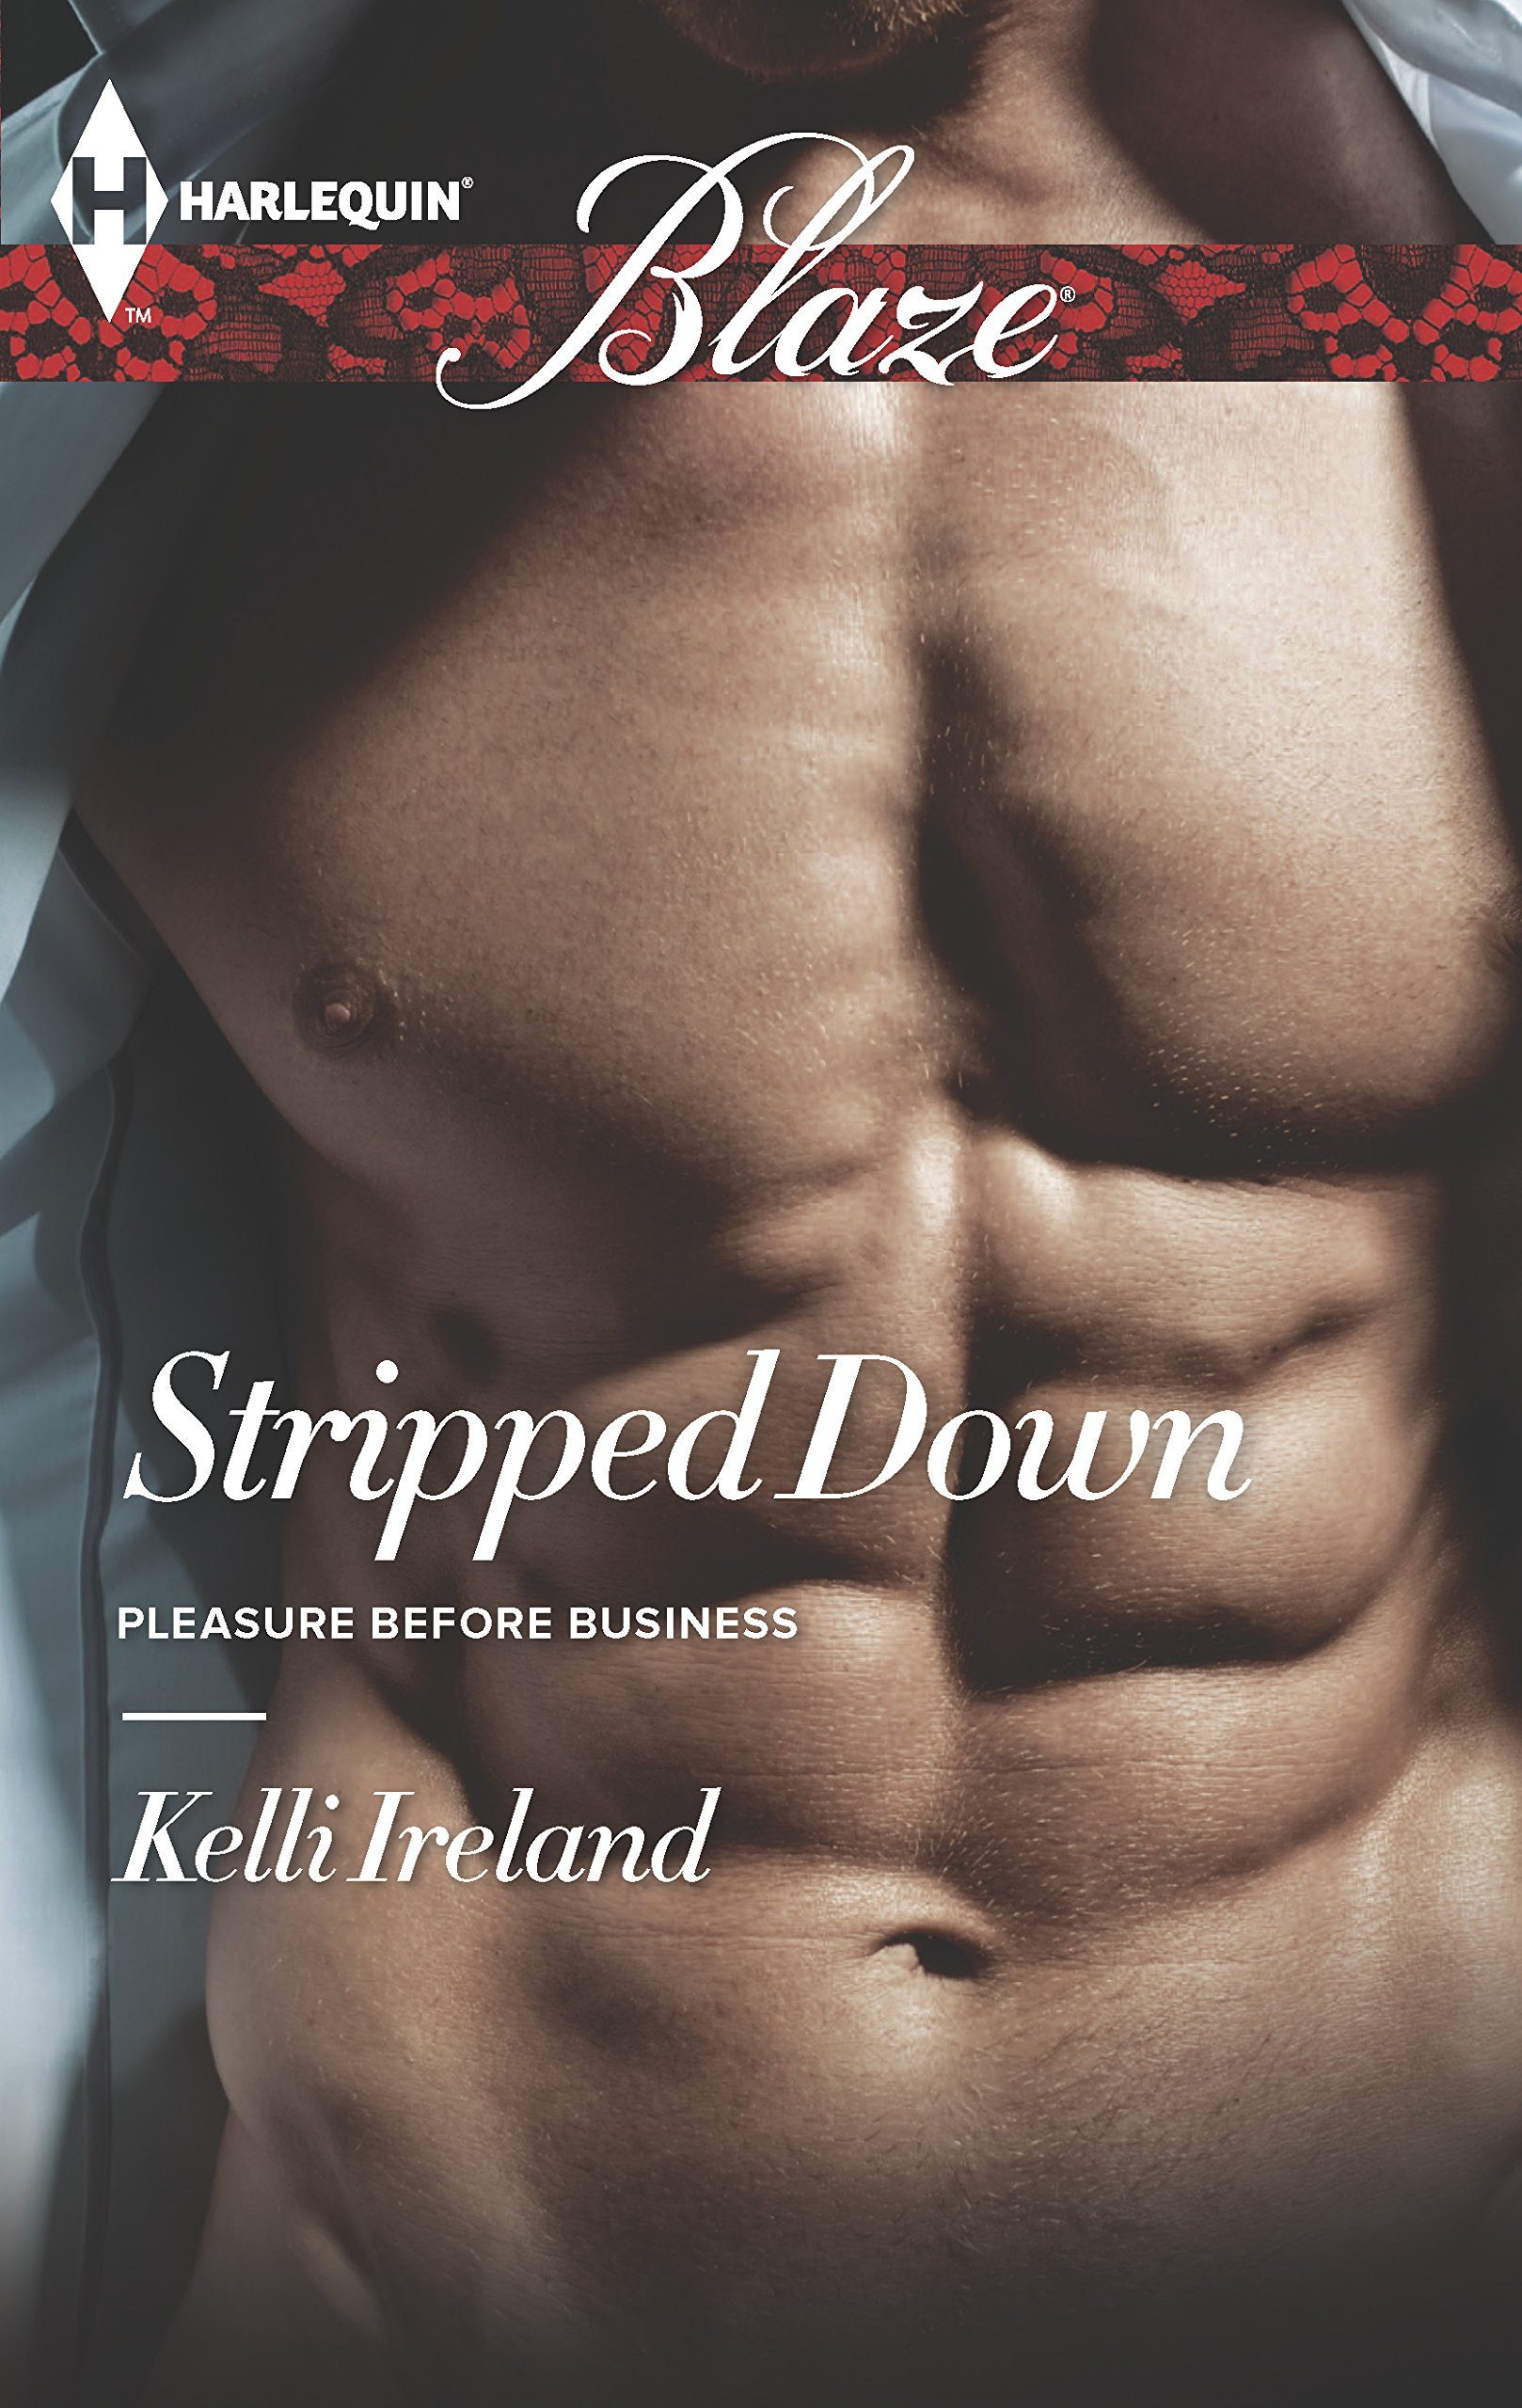 Read Stripped Down Pleasure Before Business 1 By Kelli Ireland